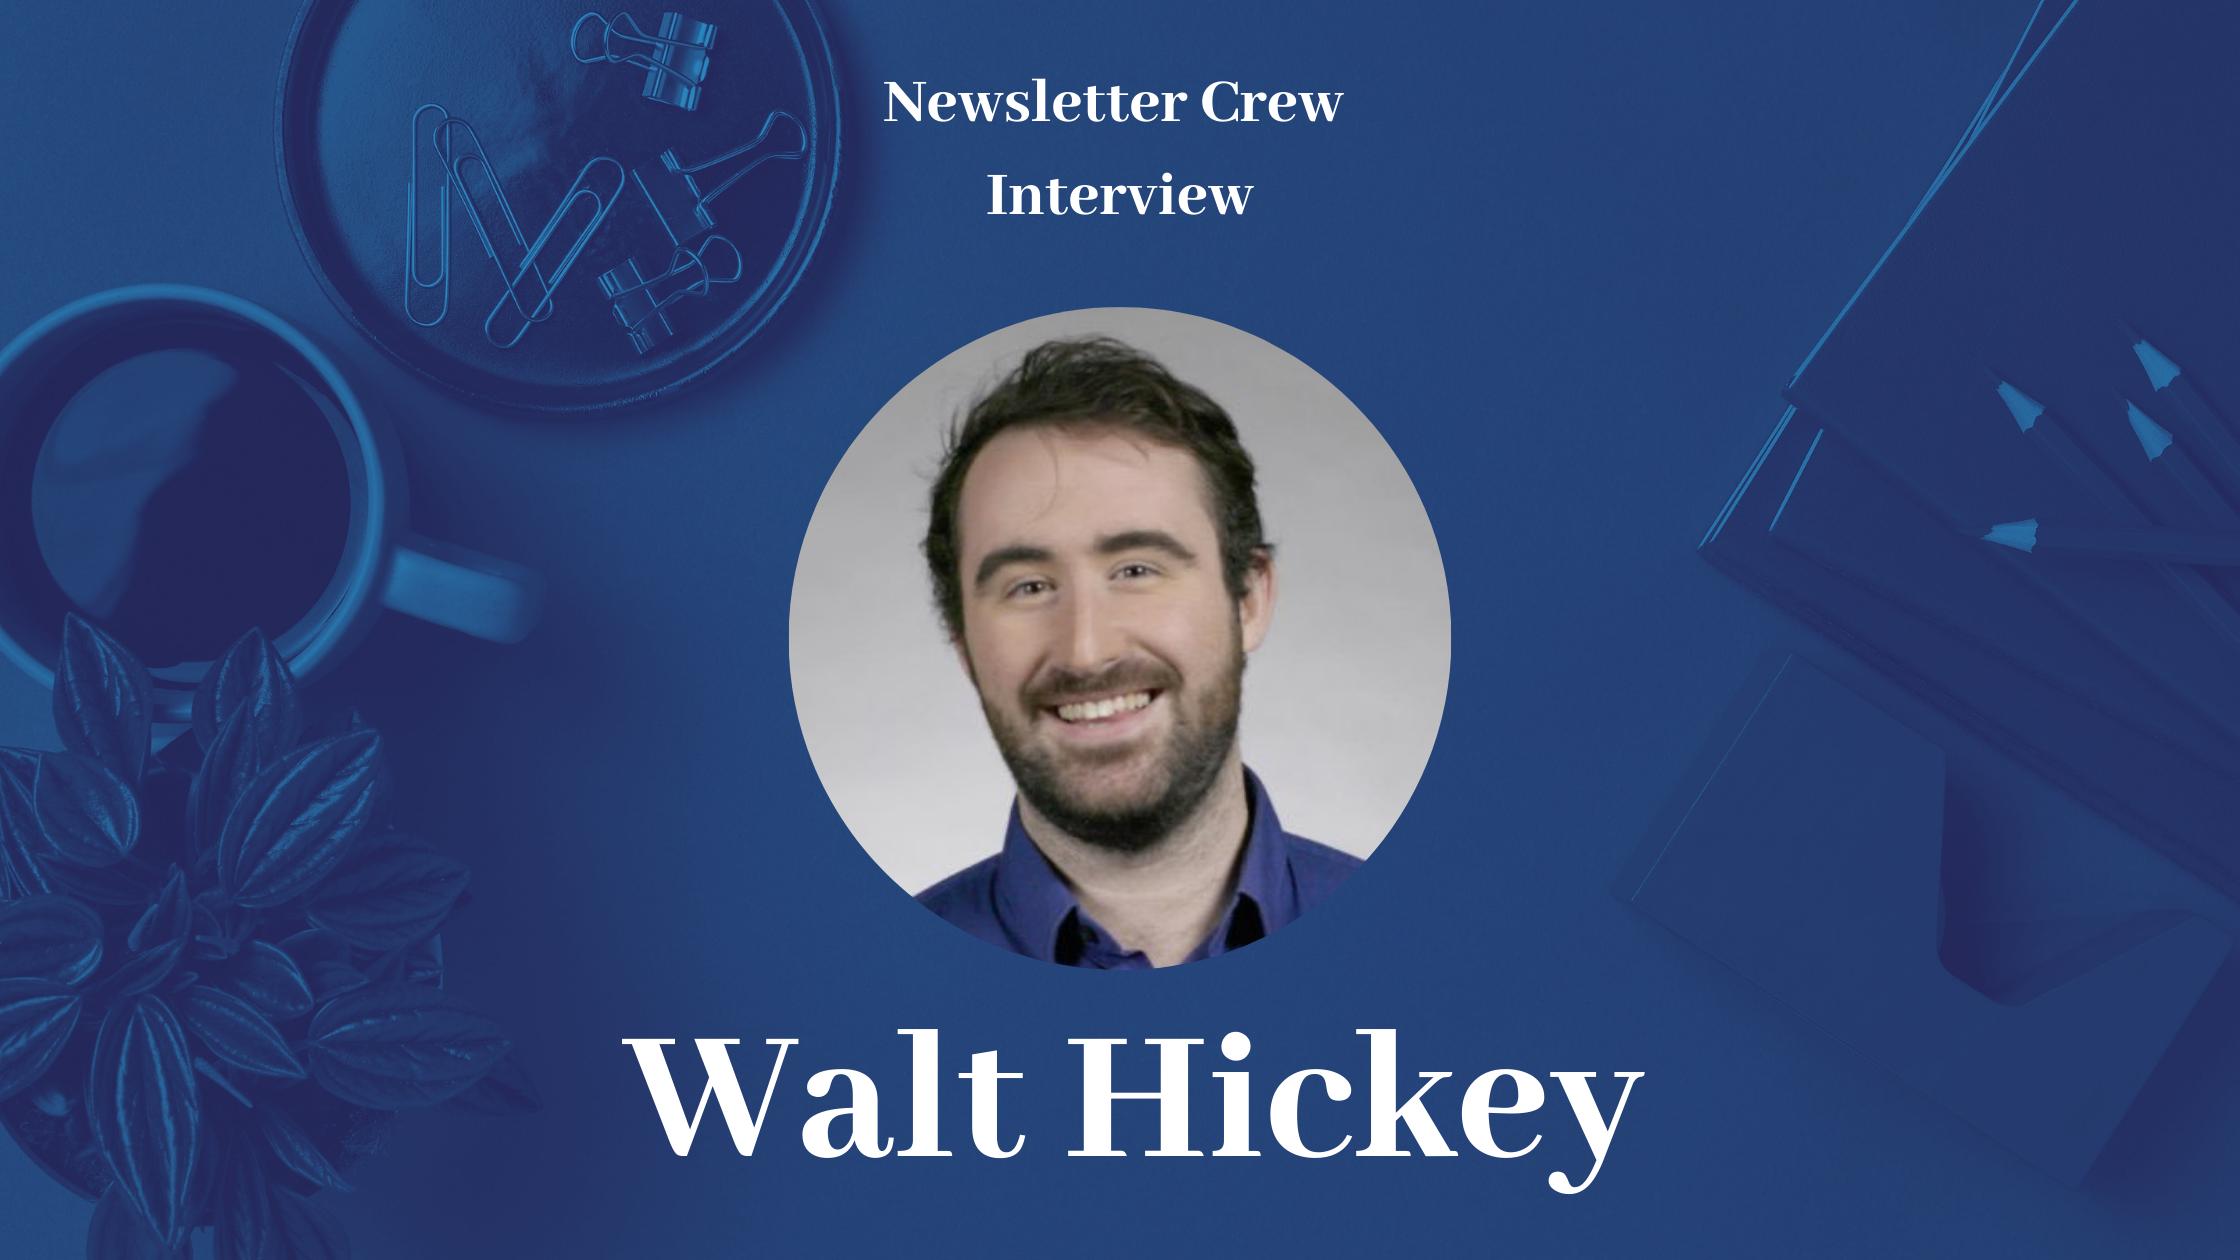 1,500 newsletters with Numlock News' Walt Hickey